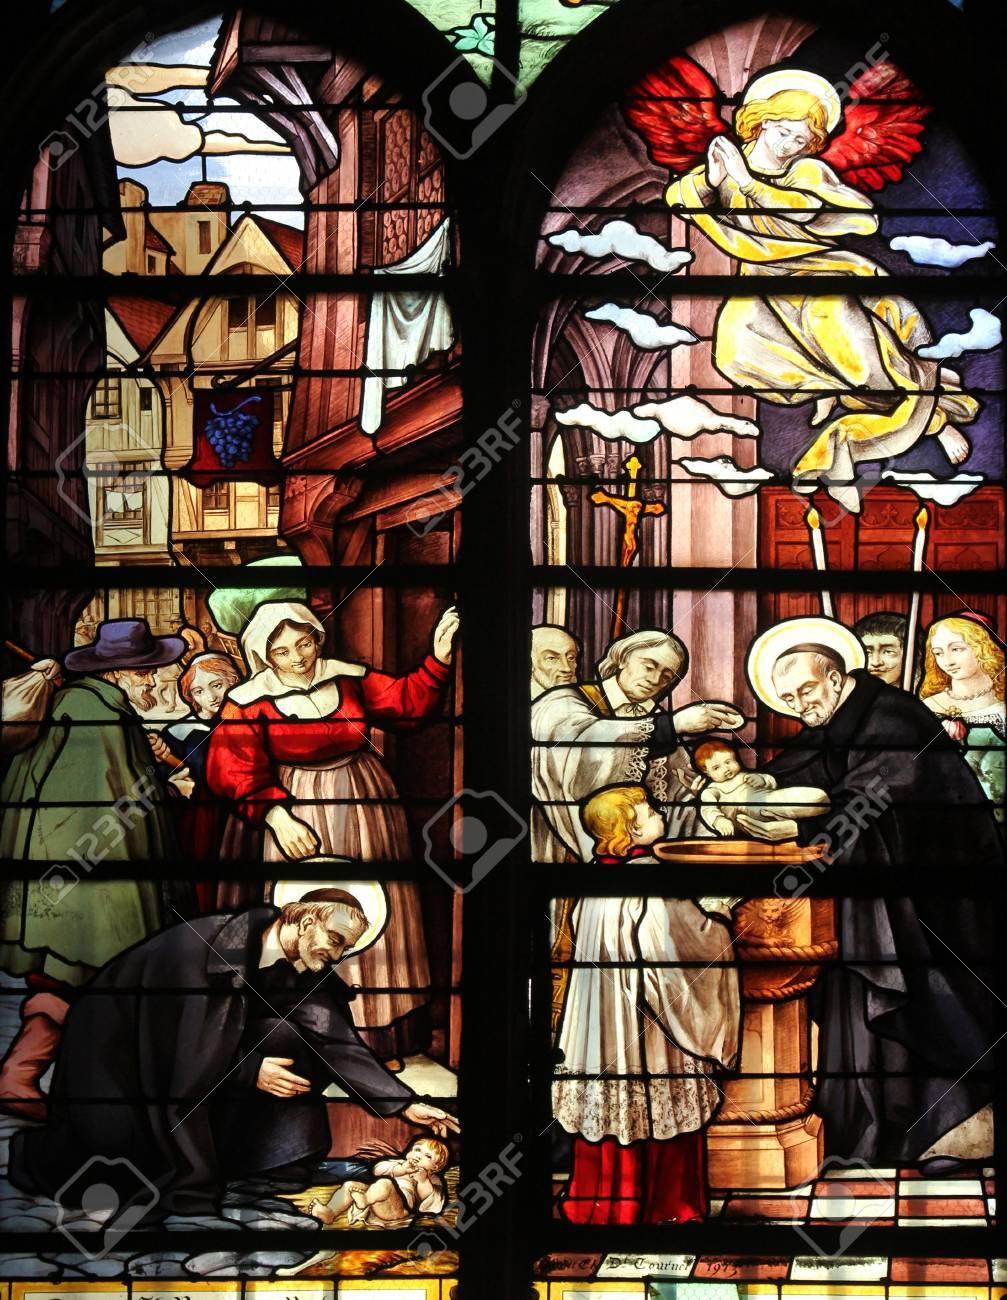 Saint Vincent de Paul raising a newborn and christening, stained glass, Saint Severin church, Paris, France Stock Photo - 21106542